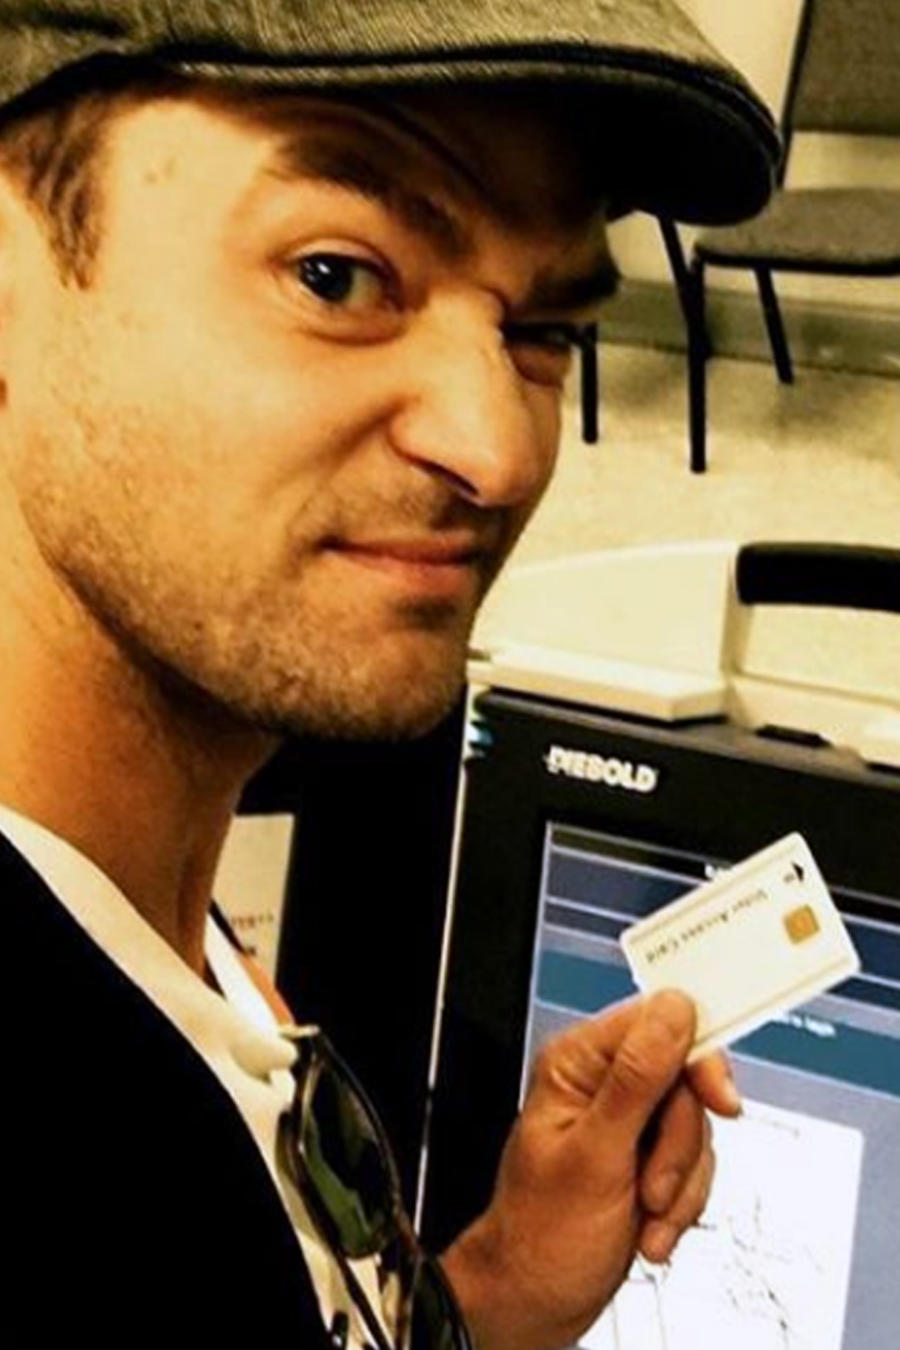 Justin Timberlake votando